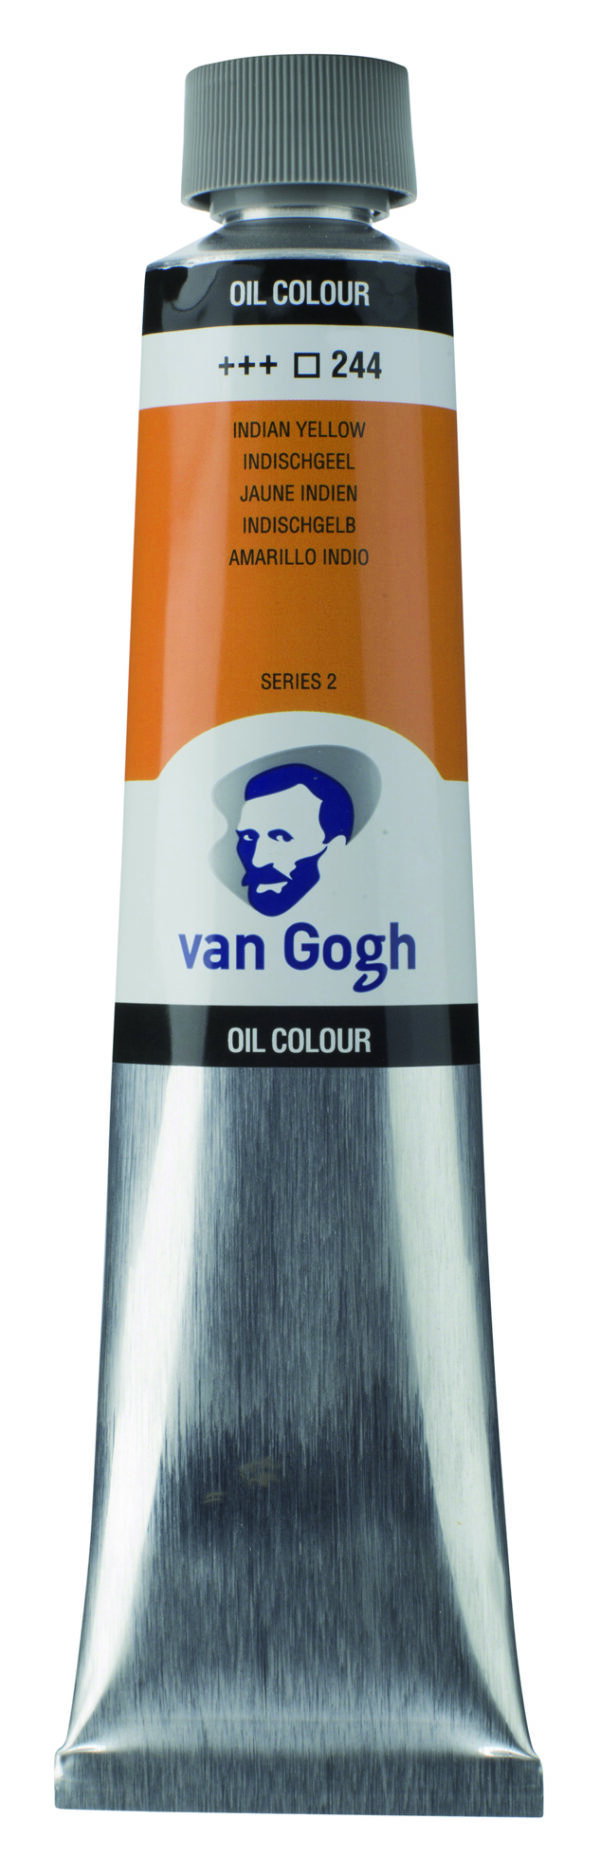 Van Gogh 244 Indian yellow - 200 ml